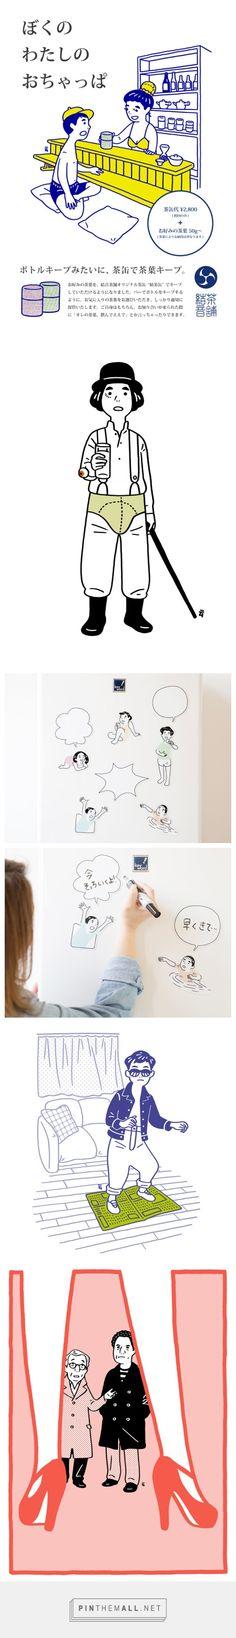 Nimura daisuke Web Artworks on tumblr - created via http://pinthemall.net